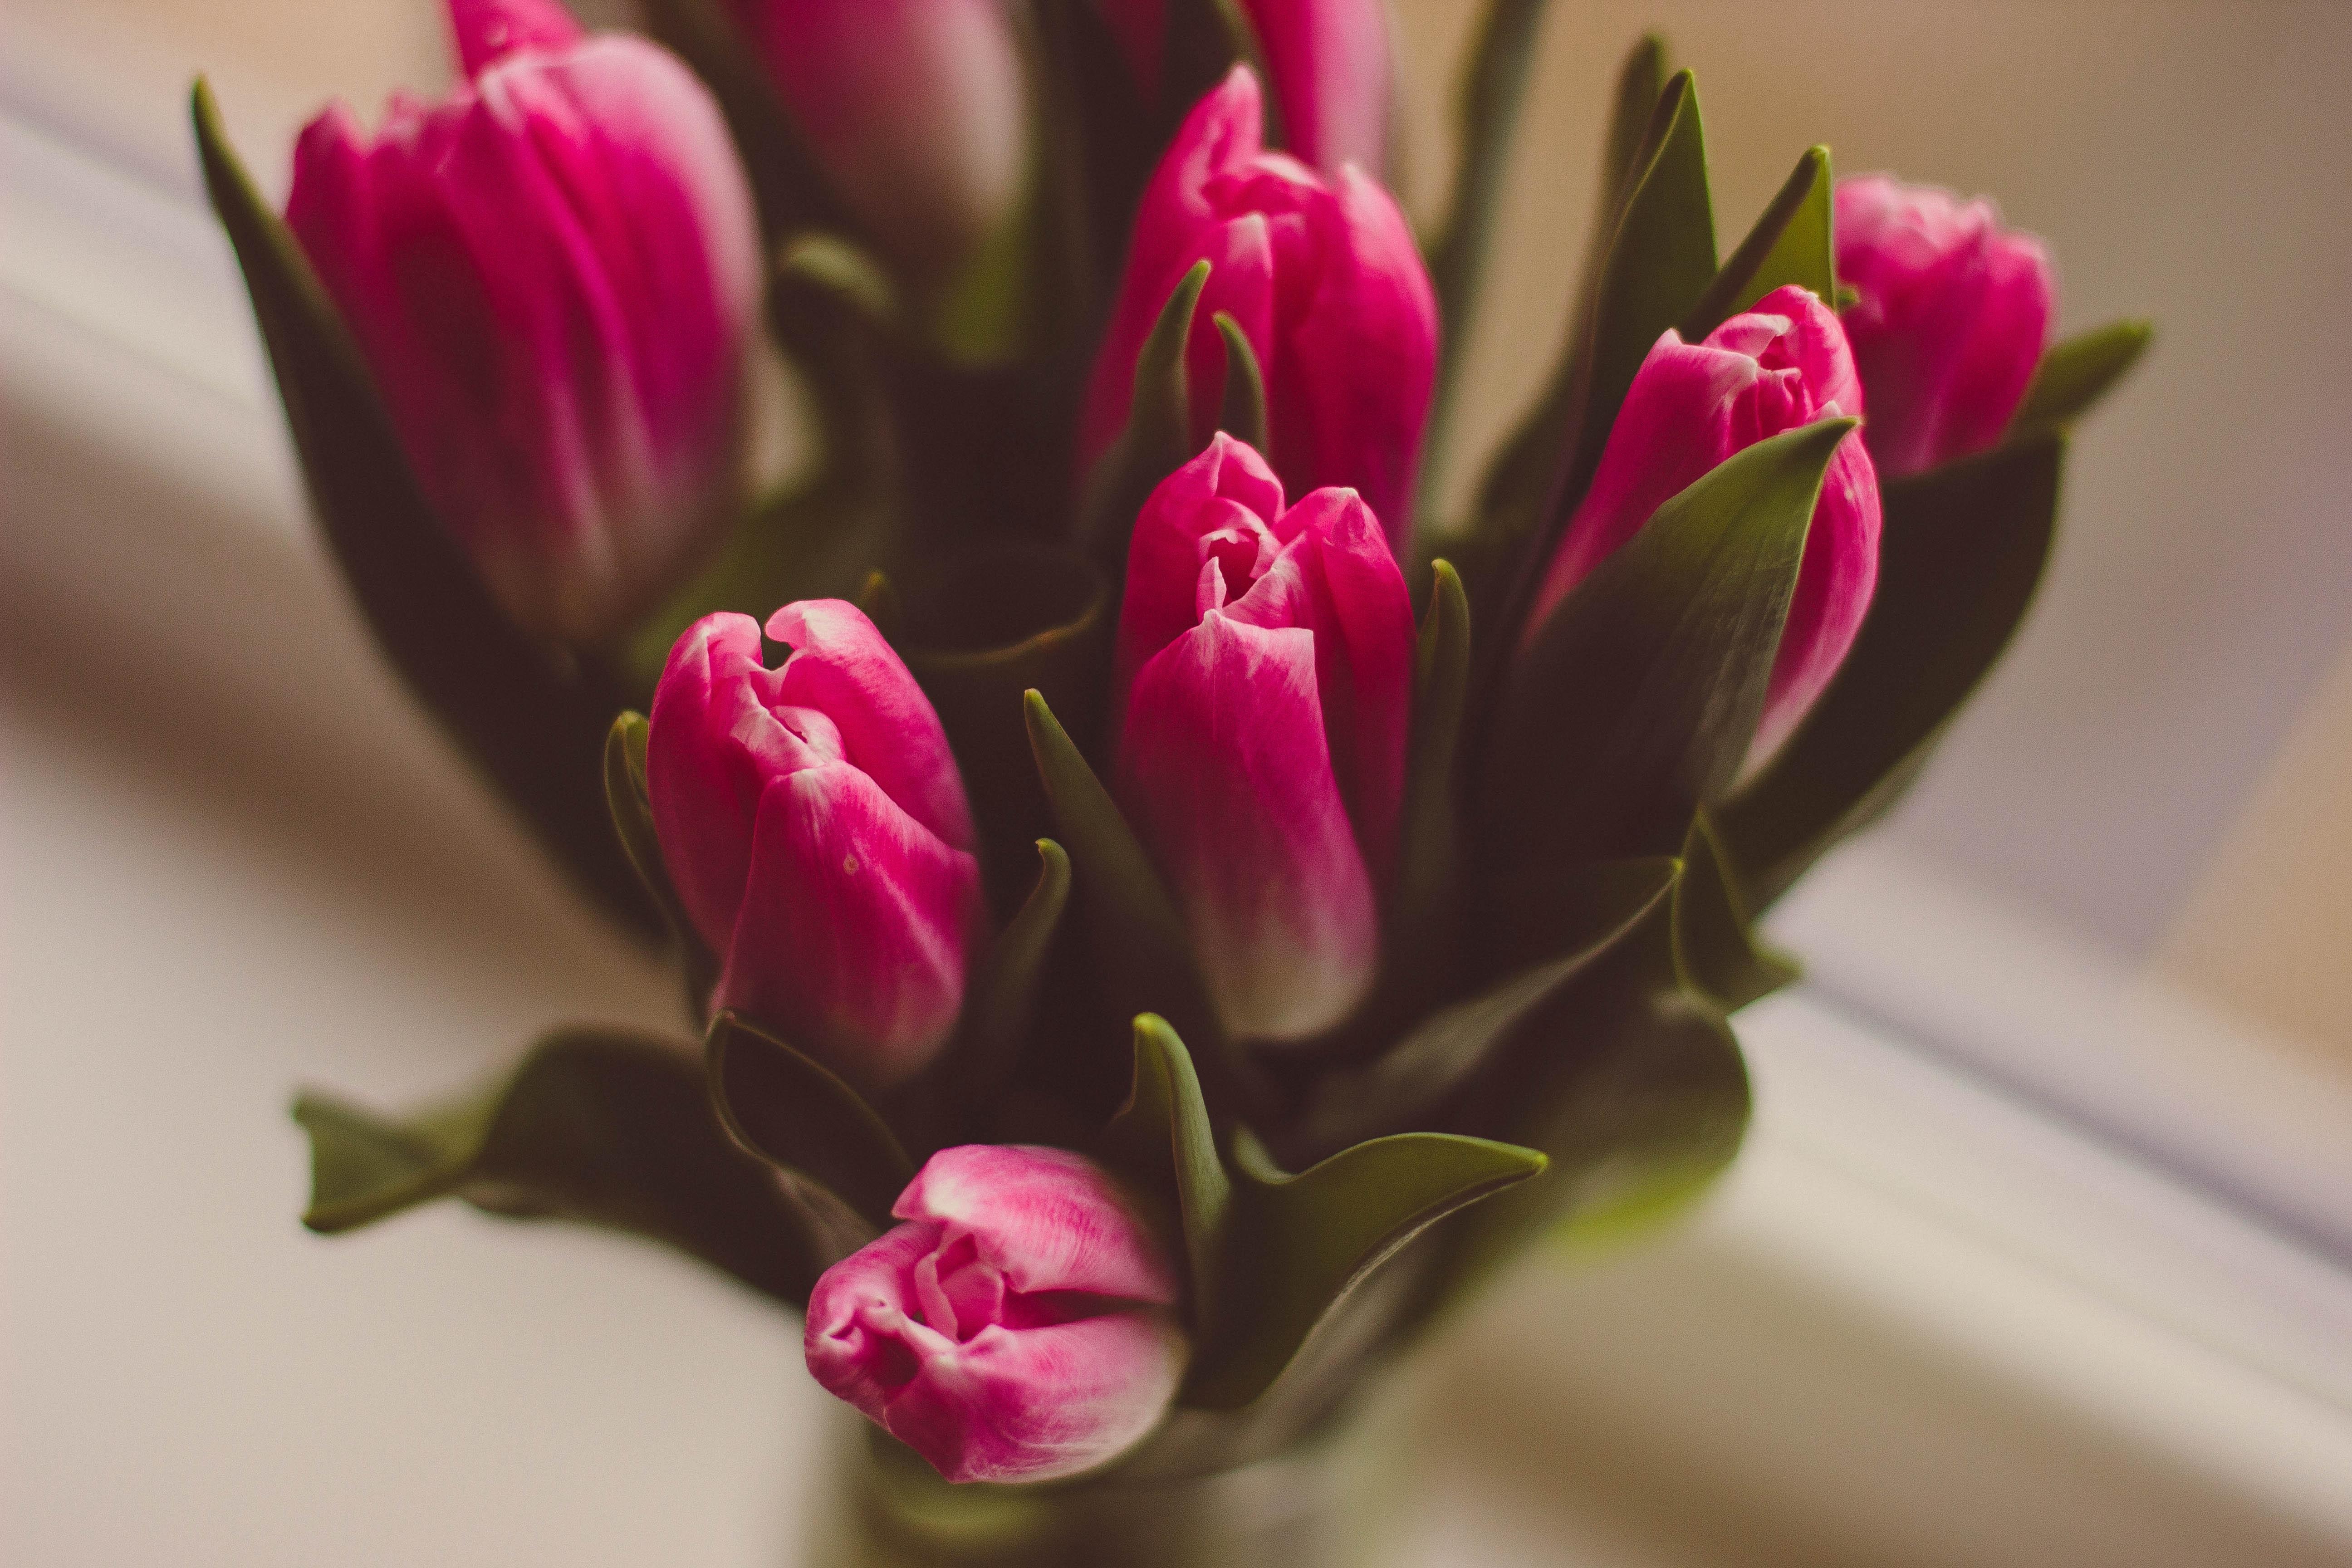 Unduh 5600 Gambar Bunga Tulip Dalam Vas Terbaik